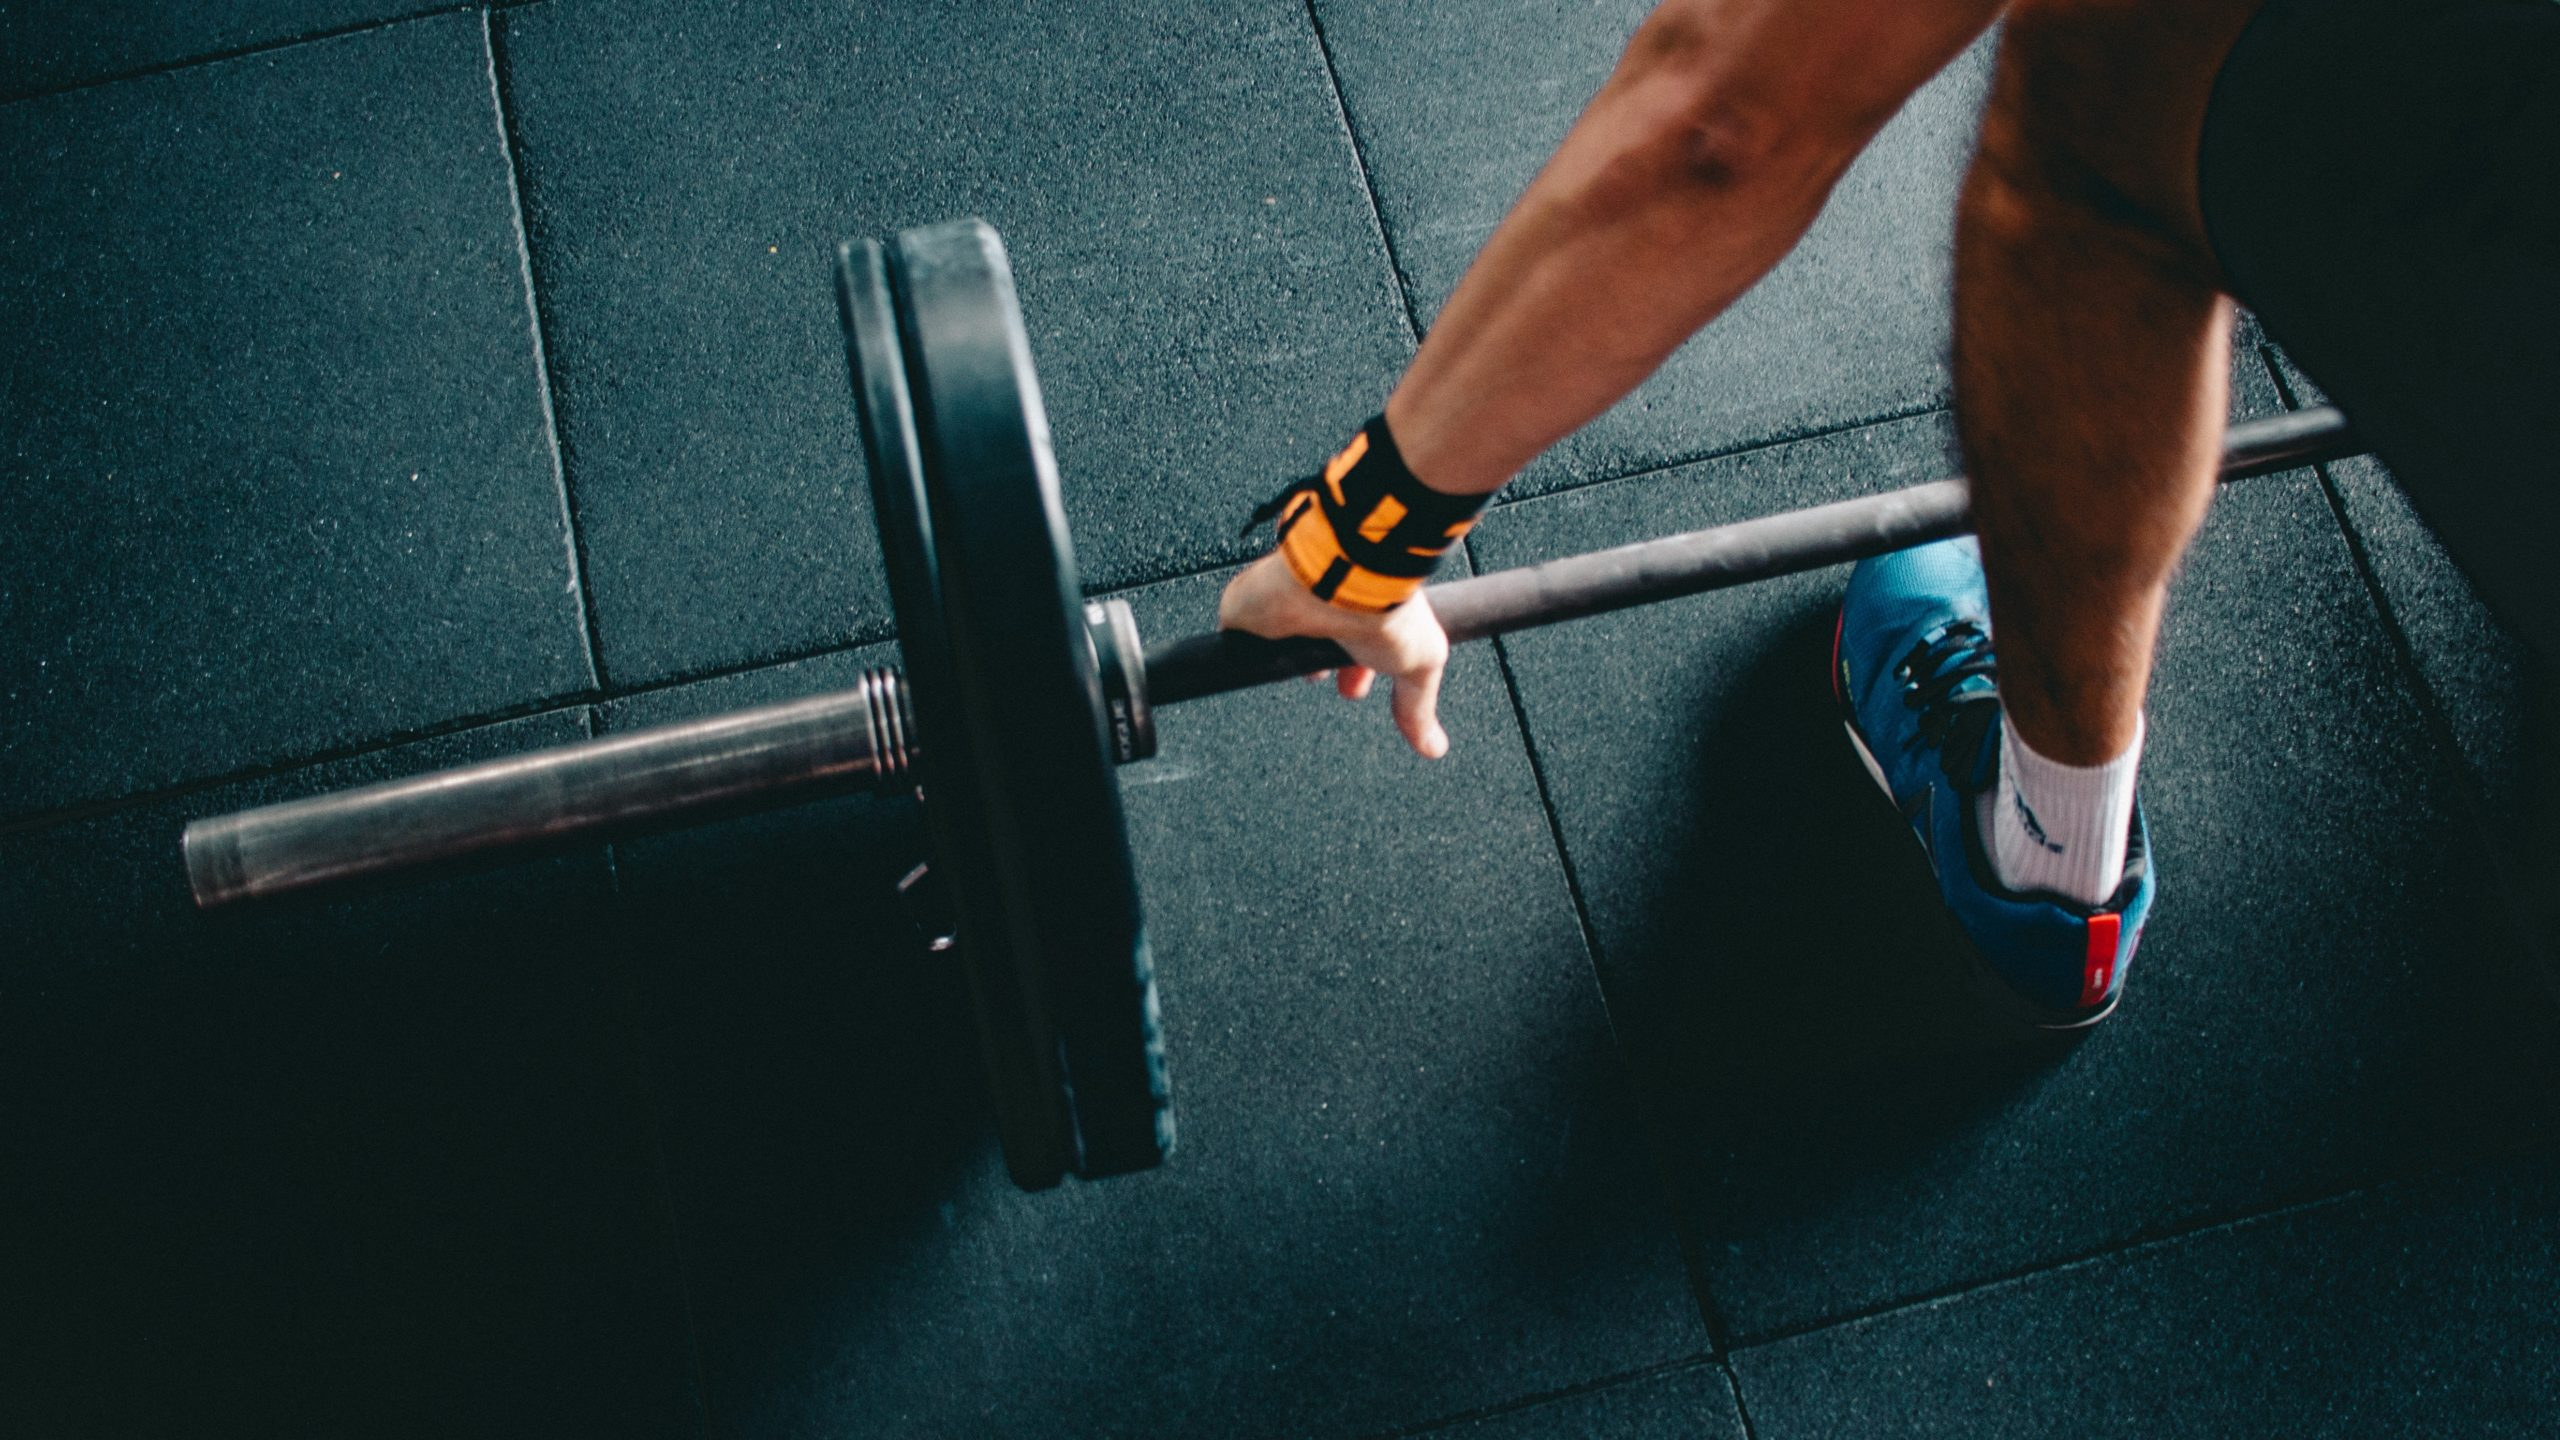 Pros and cons of a home gym thomas bensmann